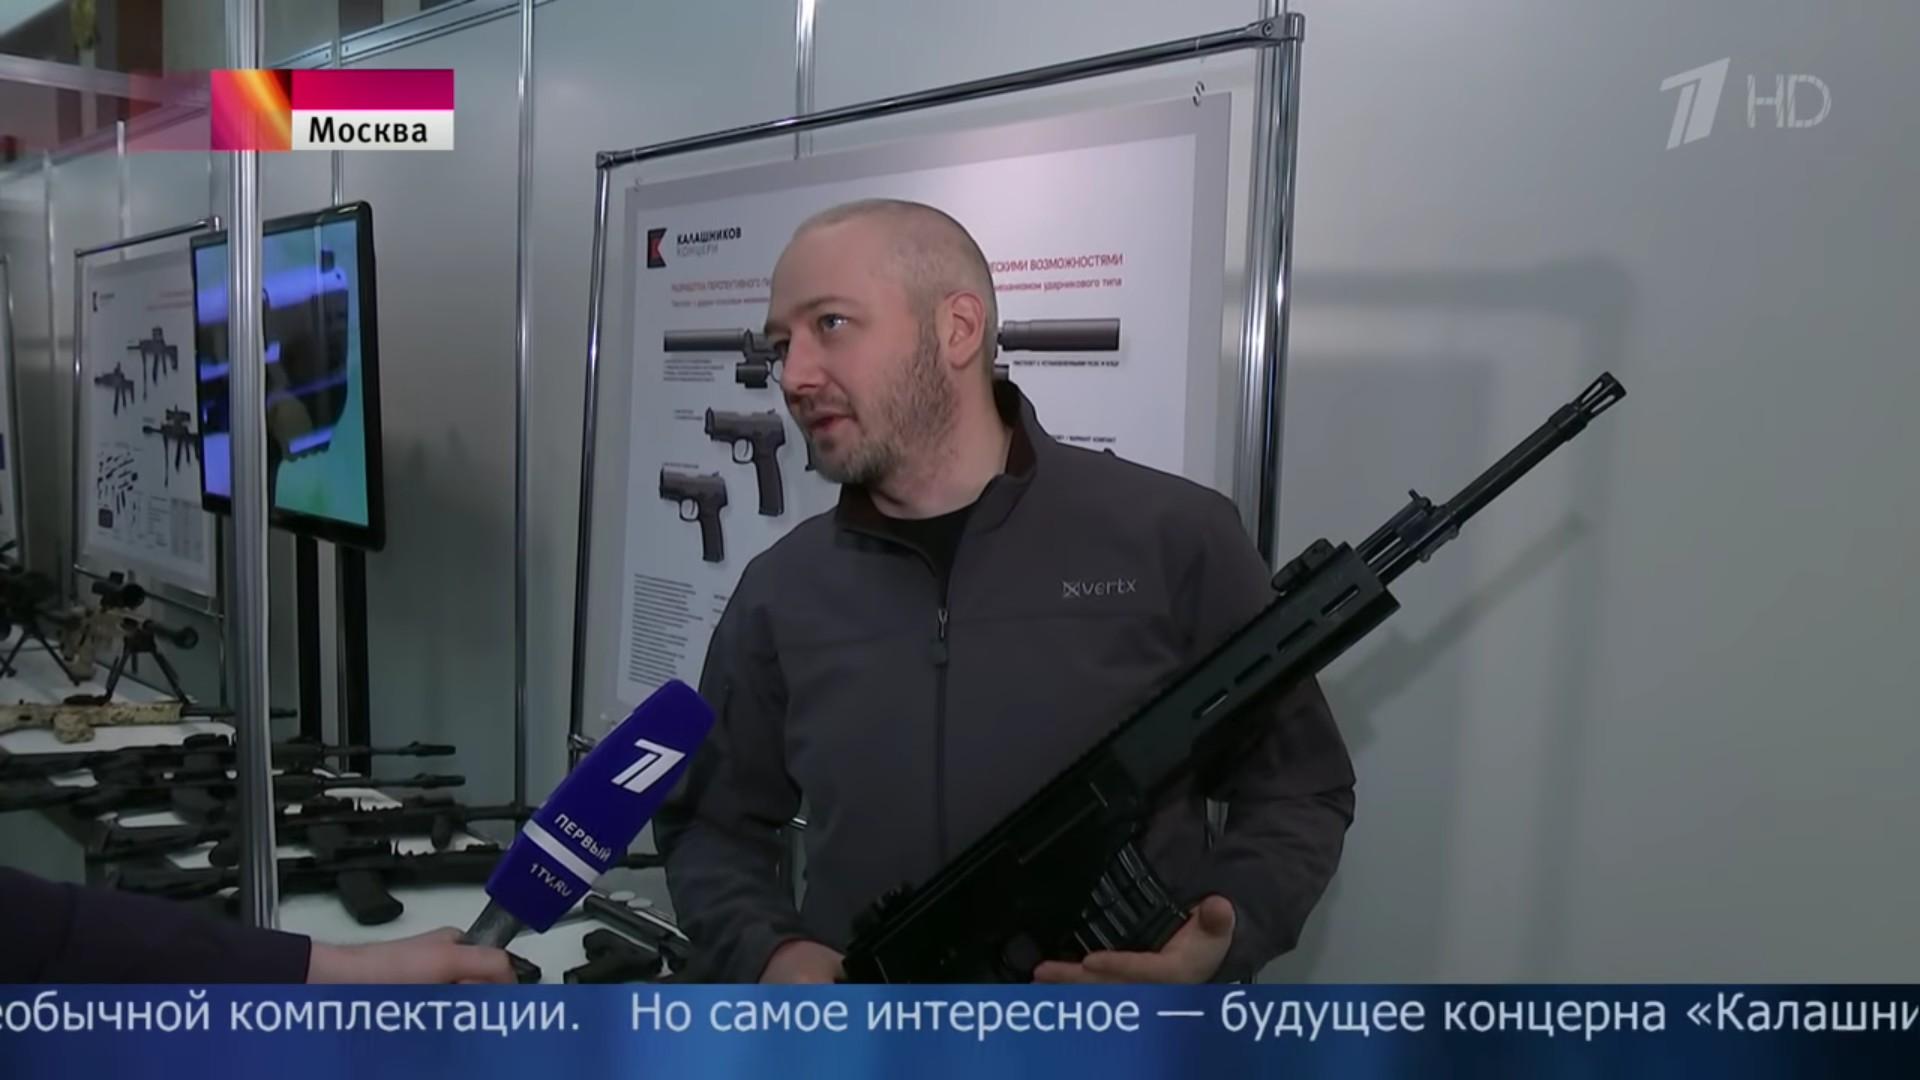 http://se.uploads.ru/uhAHk.jpg